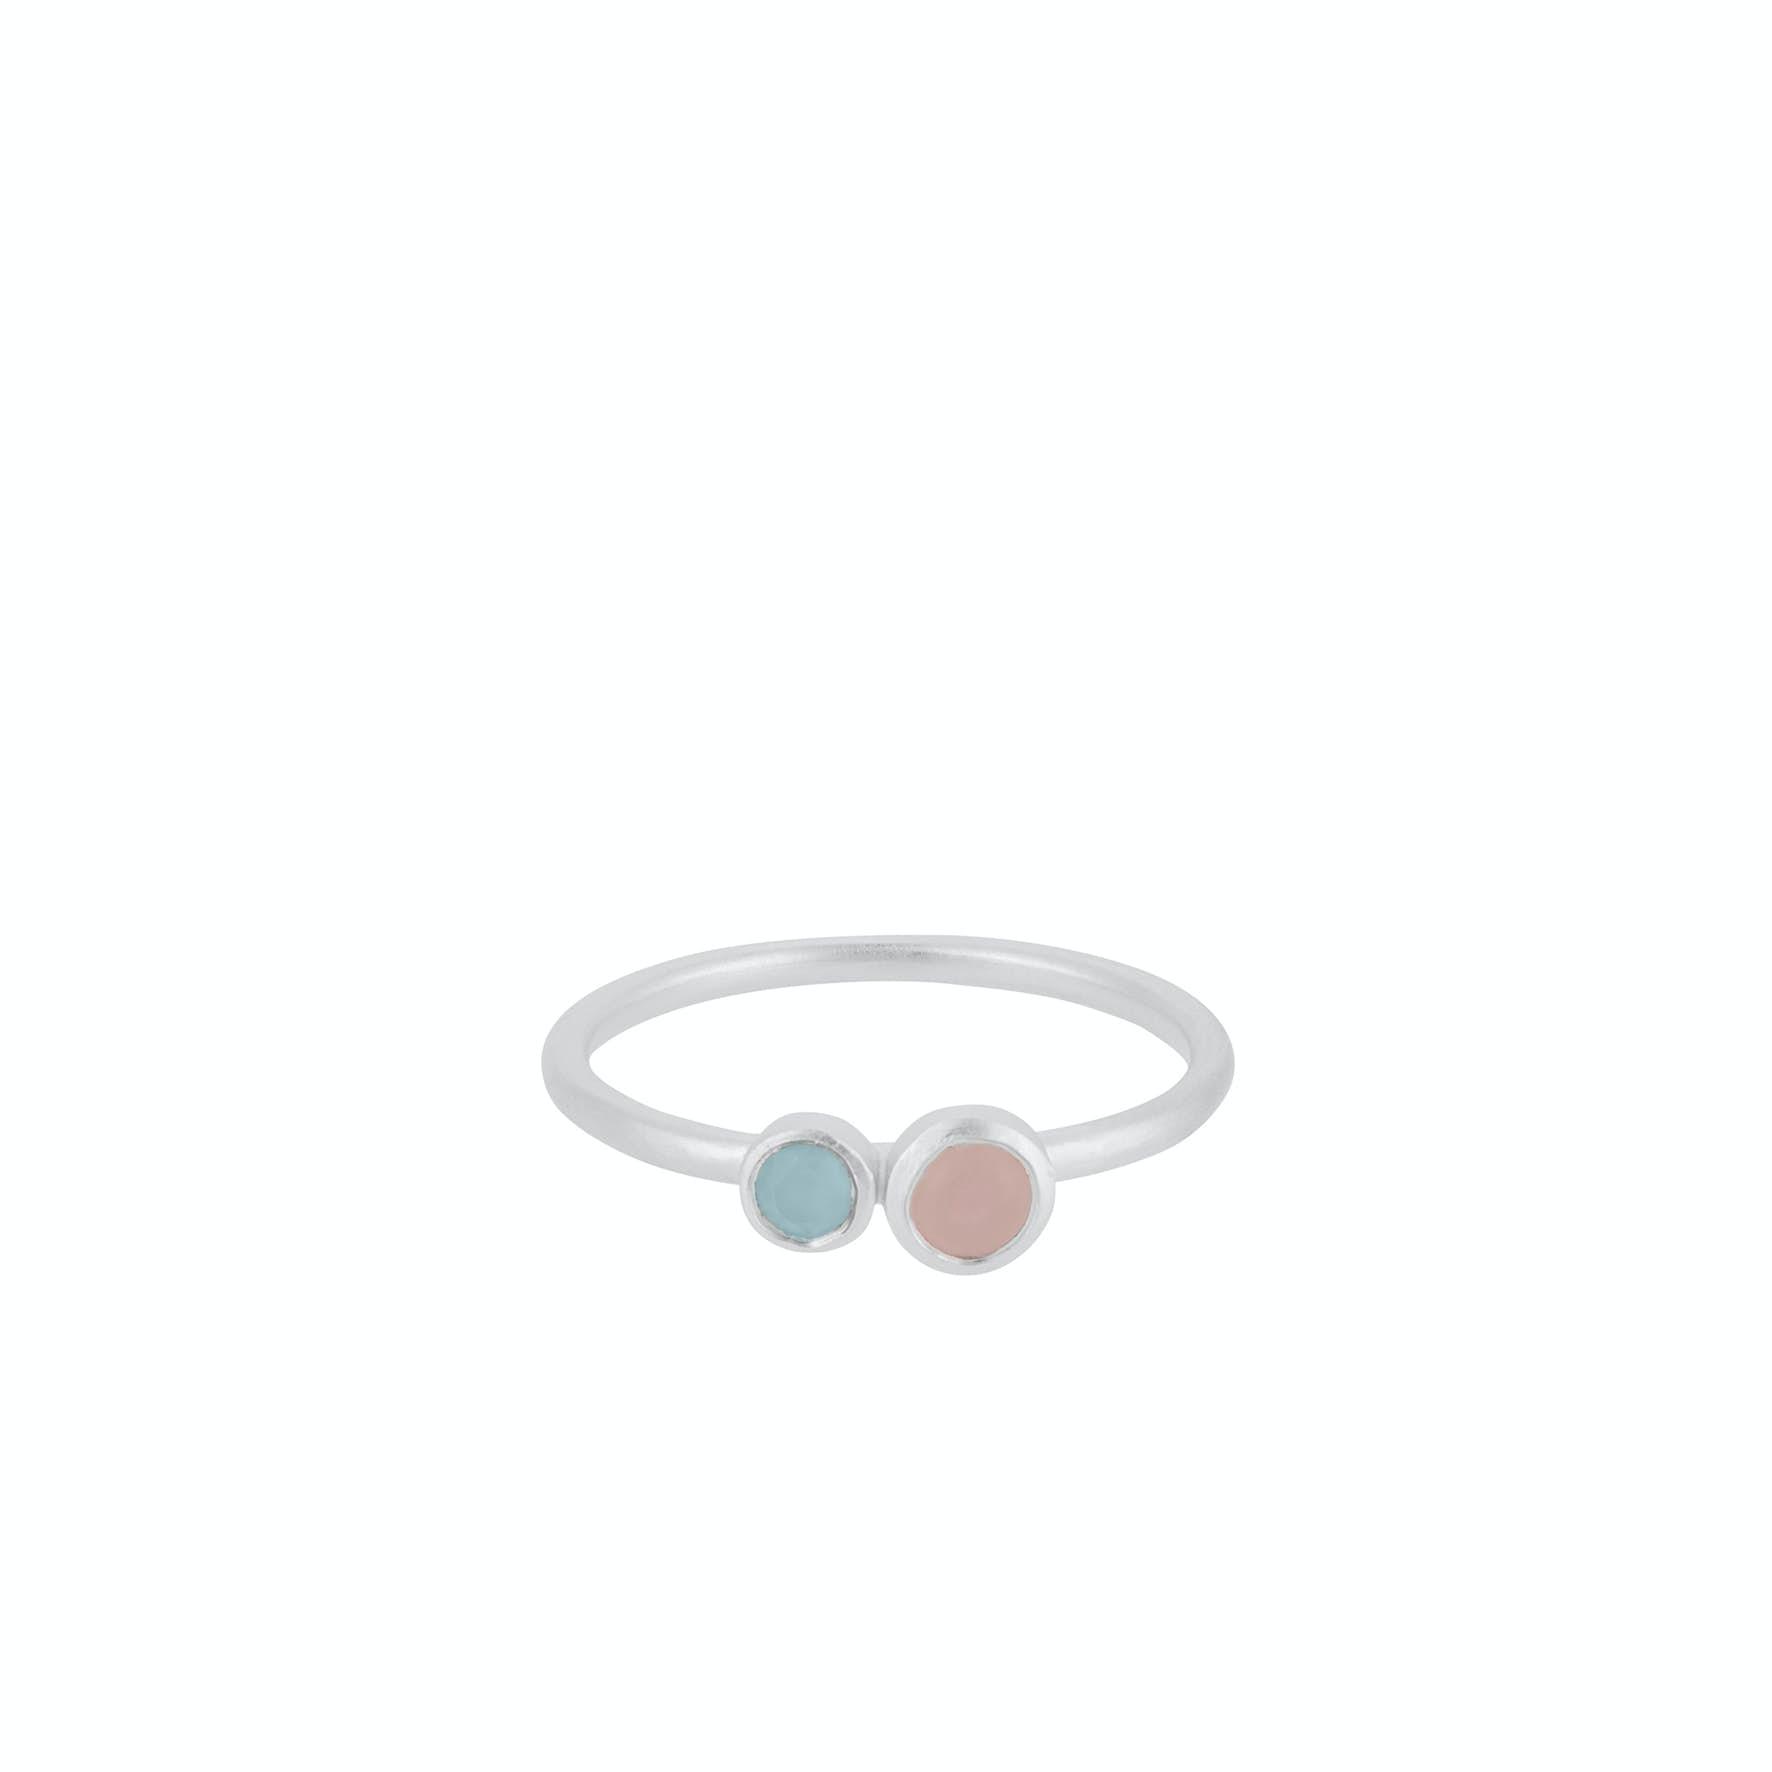 Sunset Ring von Pernille Corydon in Silber Sterling 925